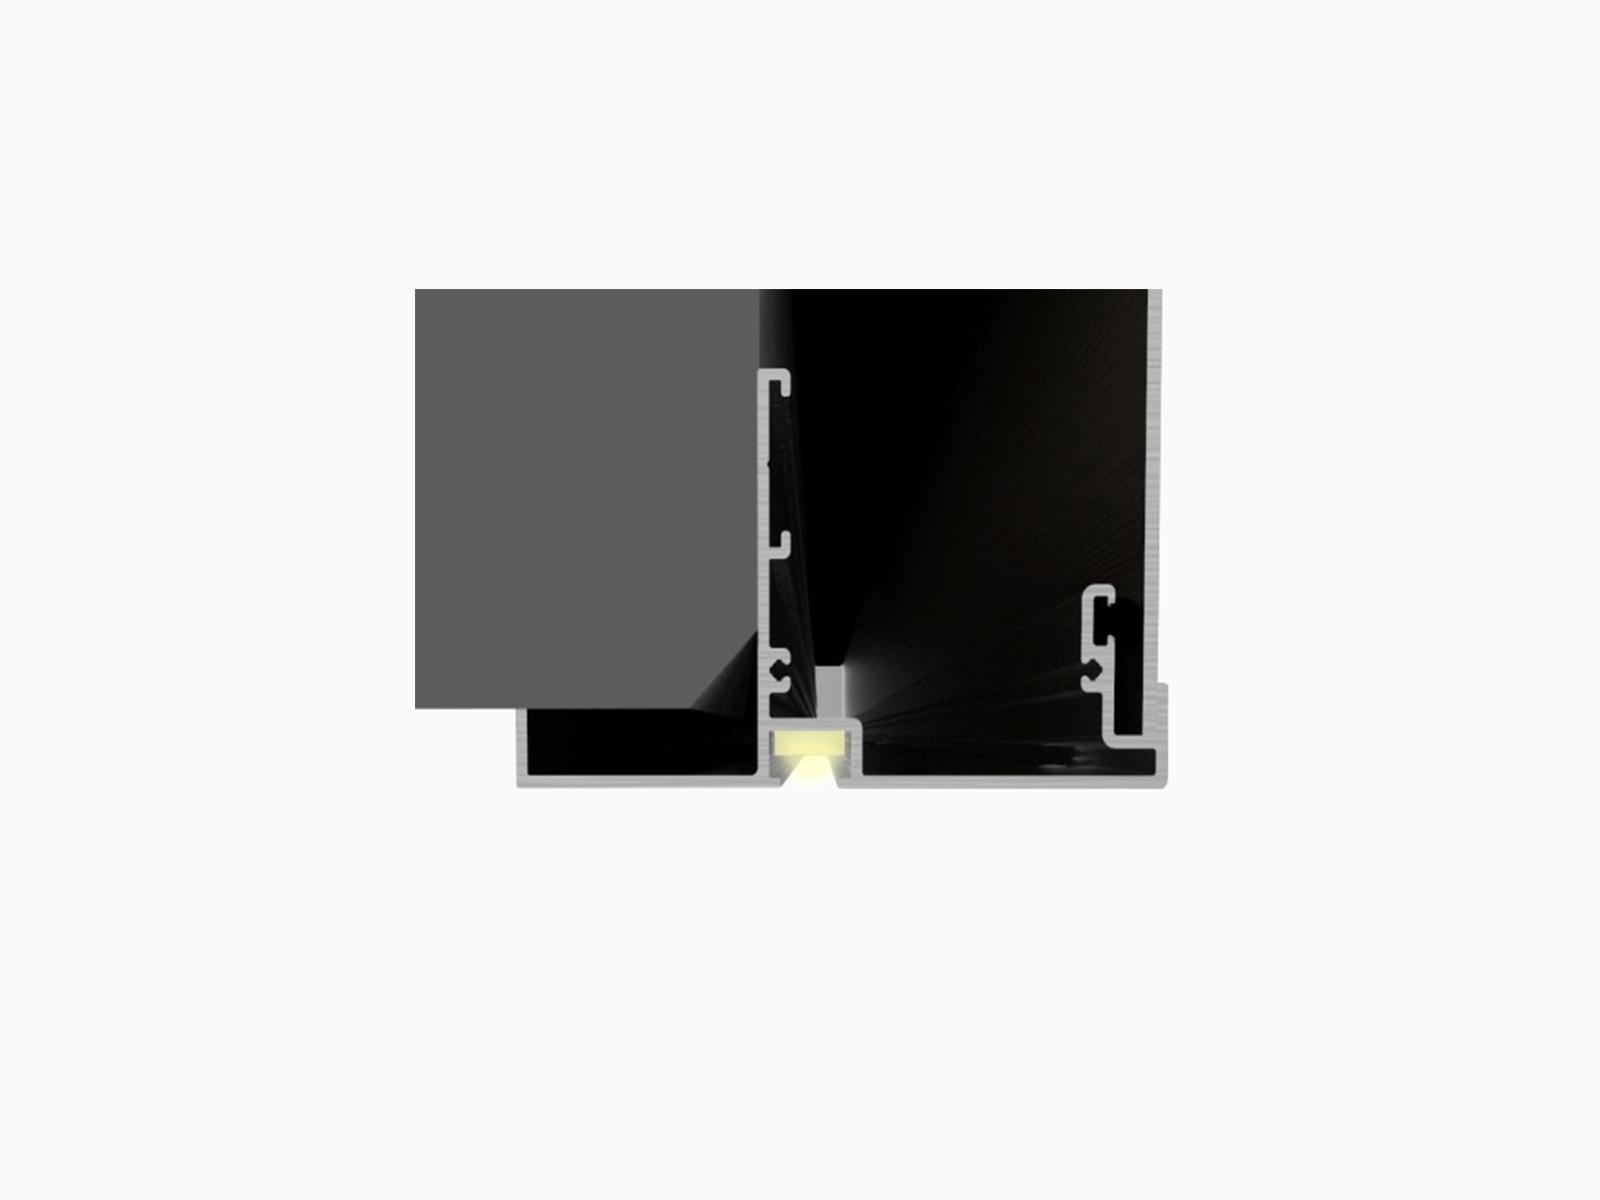 Glasbruestung Baldosa mit LED Lichtleiste inkl Trafo